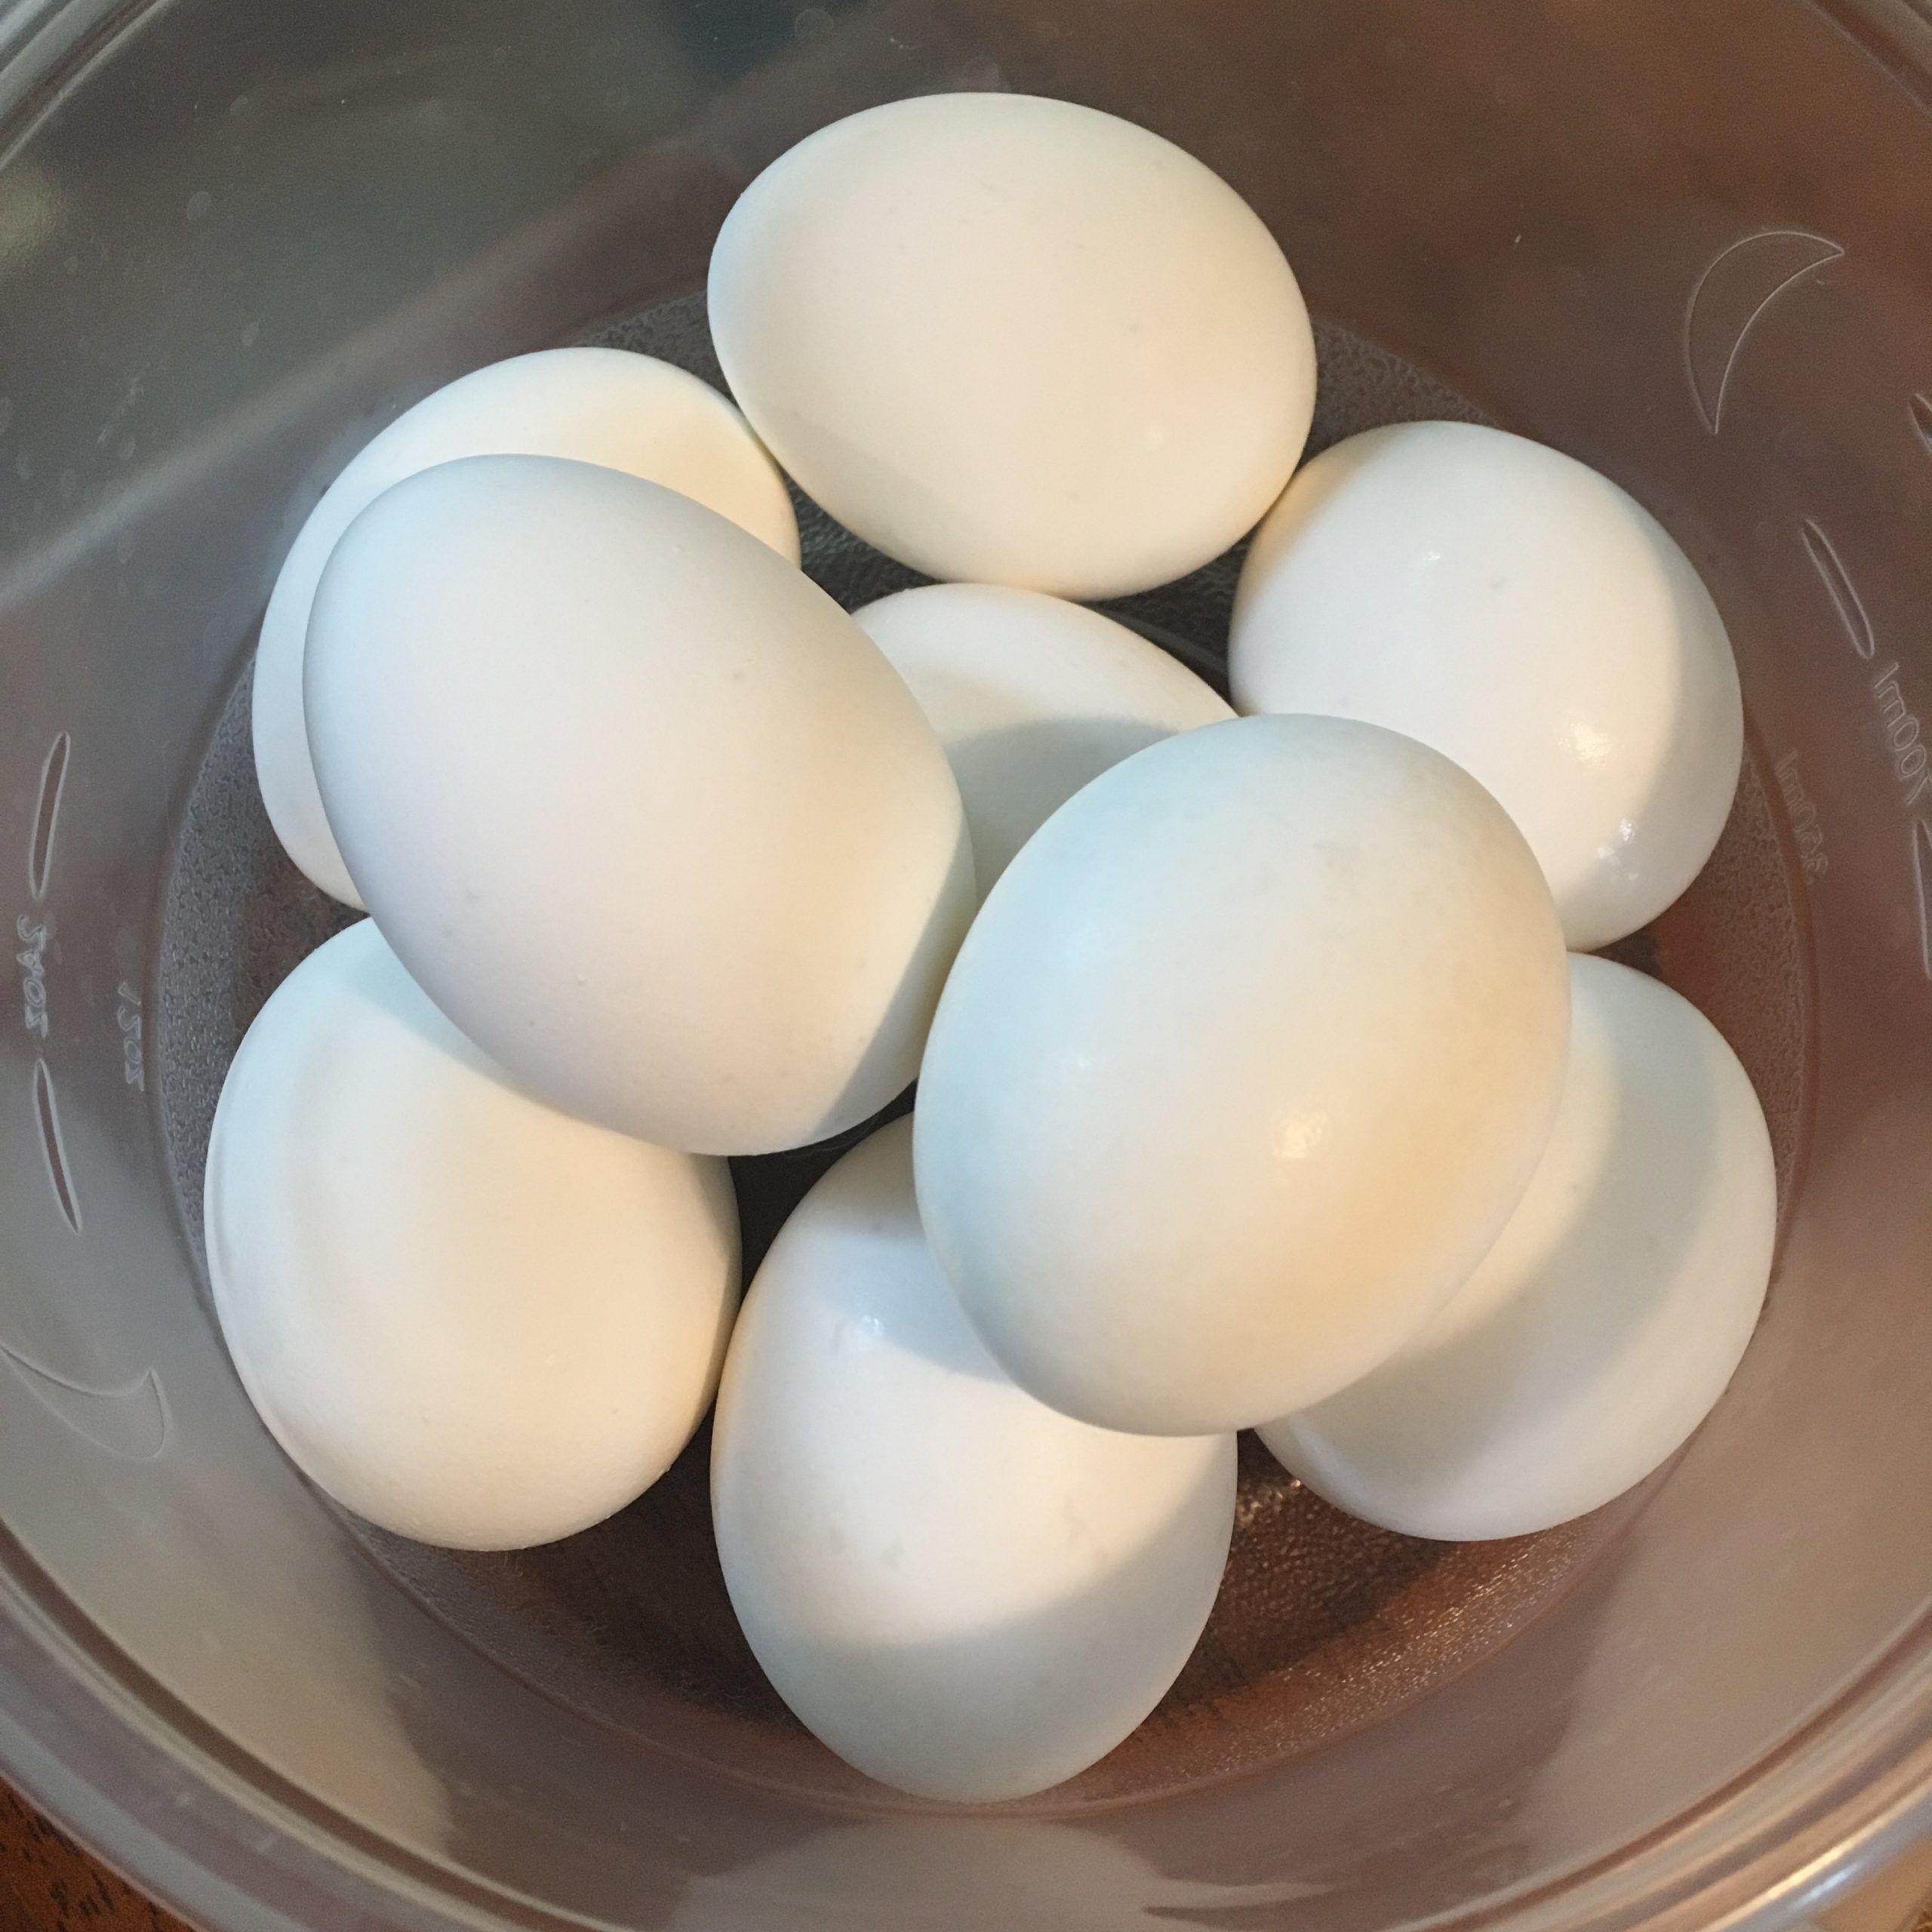 Easy to Peel Hard Boiled Eggs - Everyday Wellness